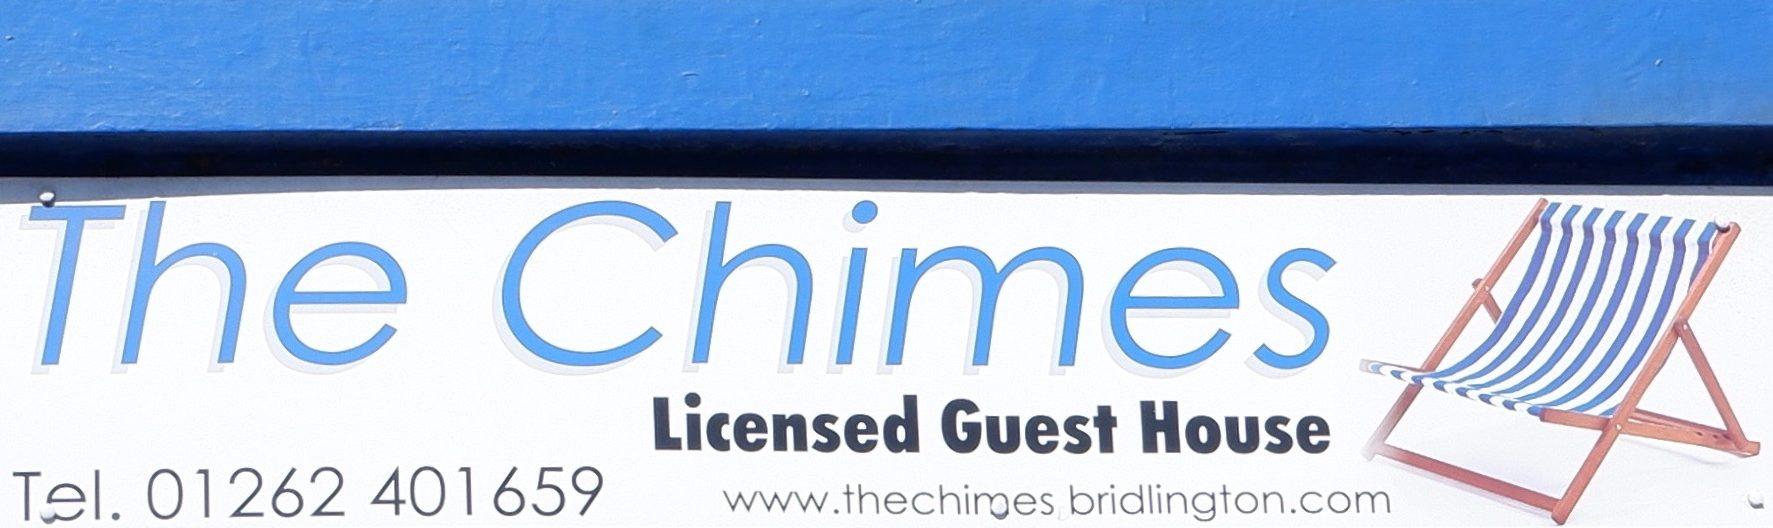 The Chimes | Guest House | Bridlington